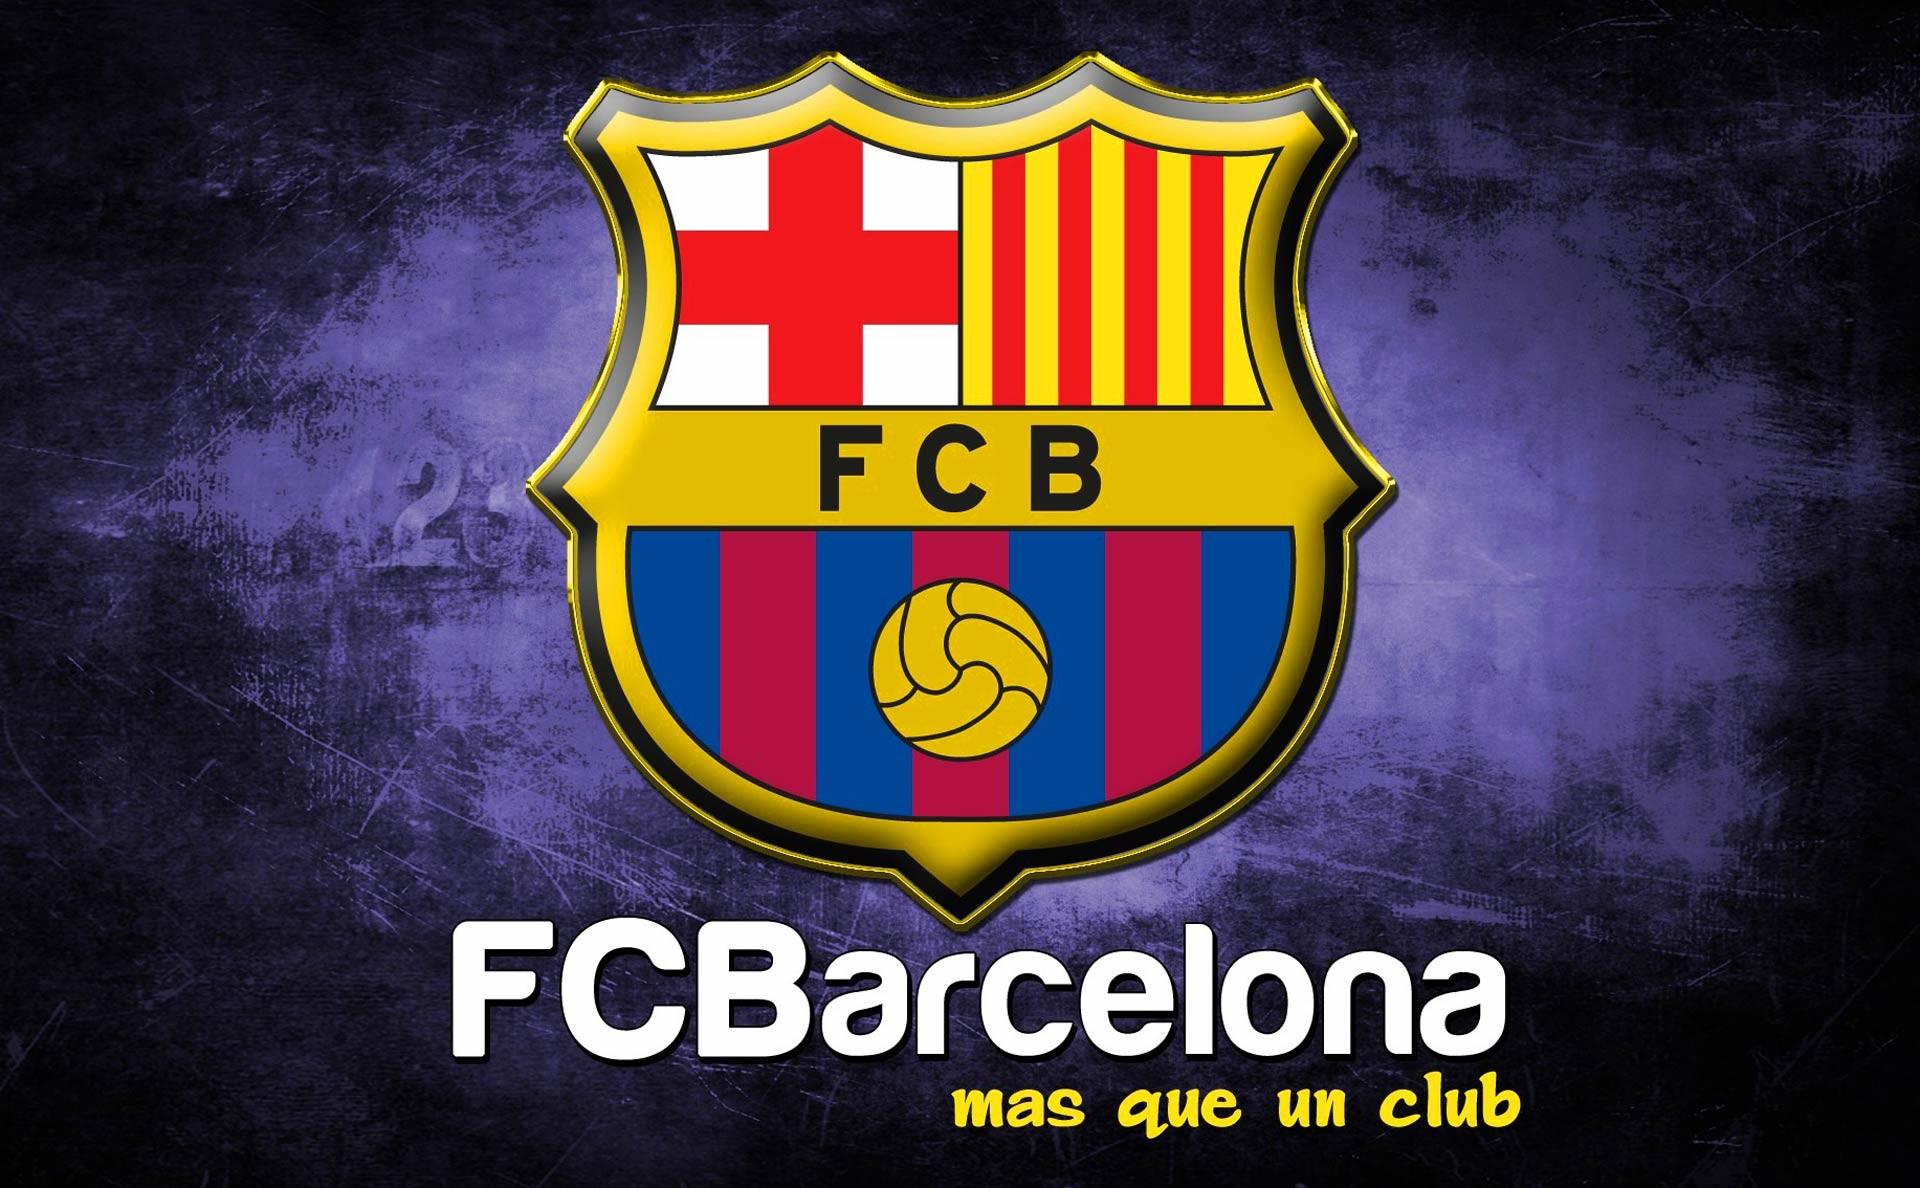 Barcelona Football Club Wallpaper – Football Wallpaper HD